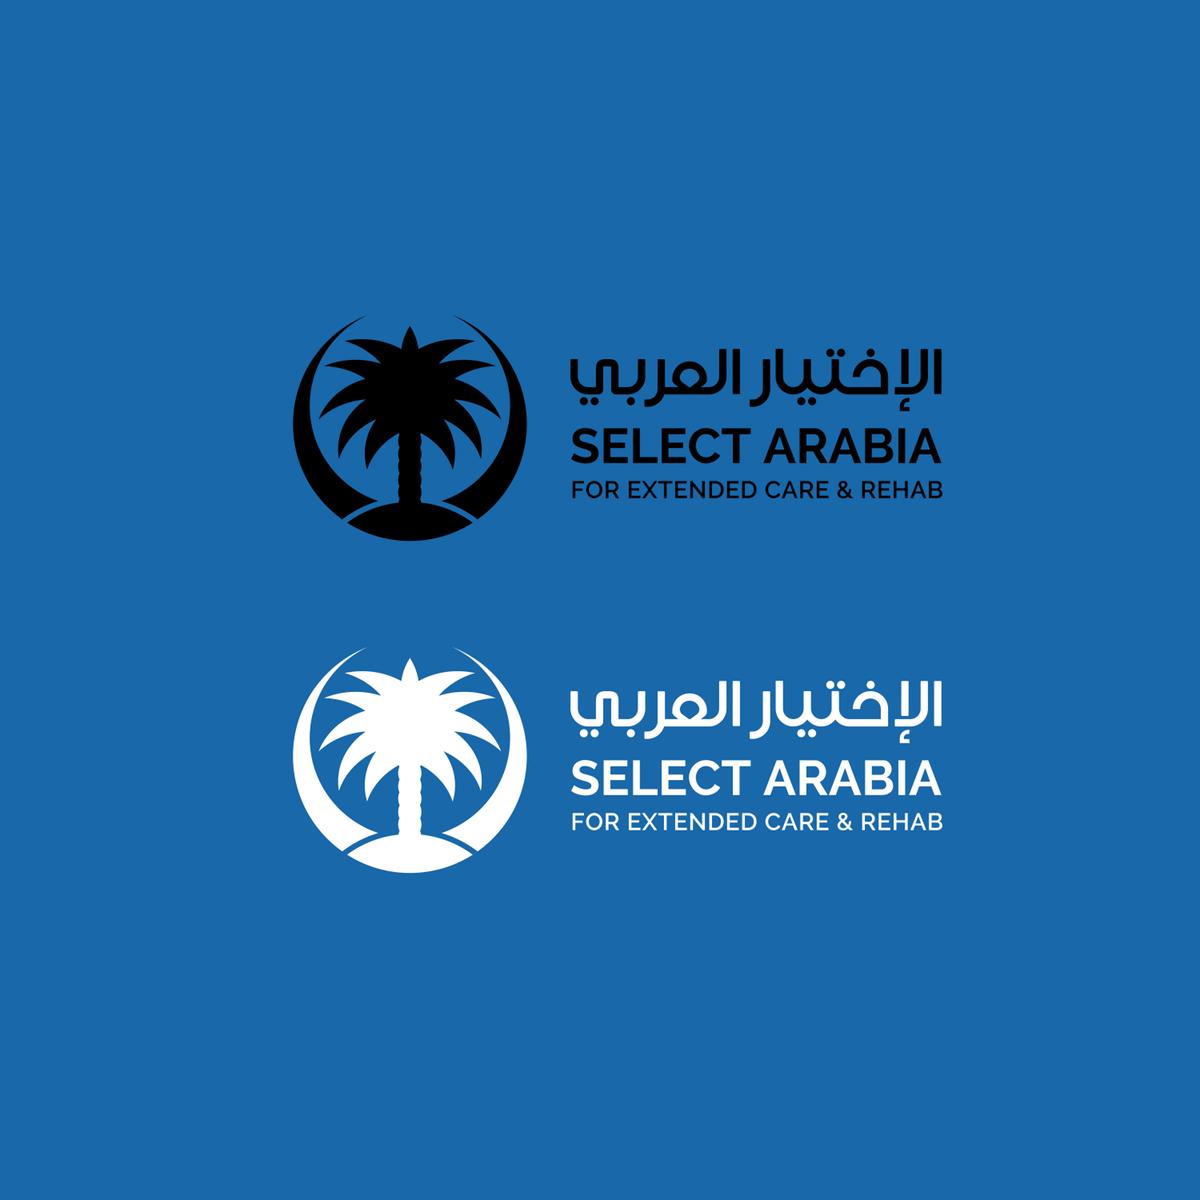 Select Arabia